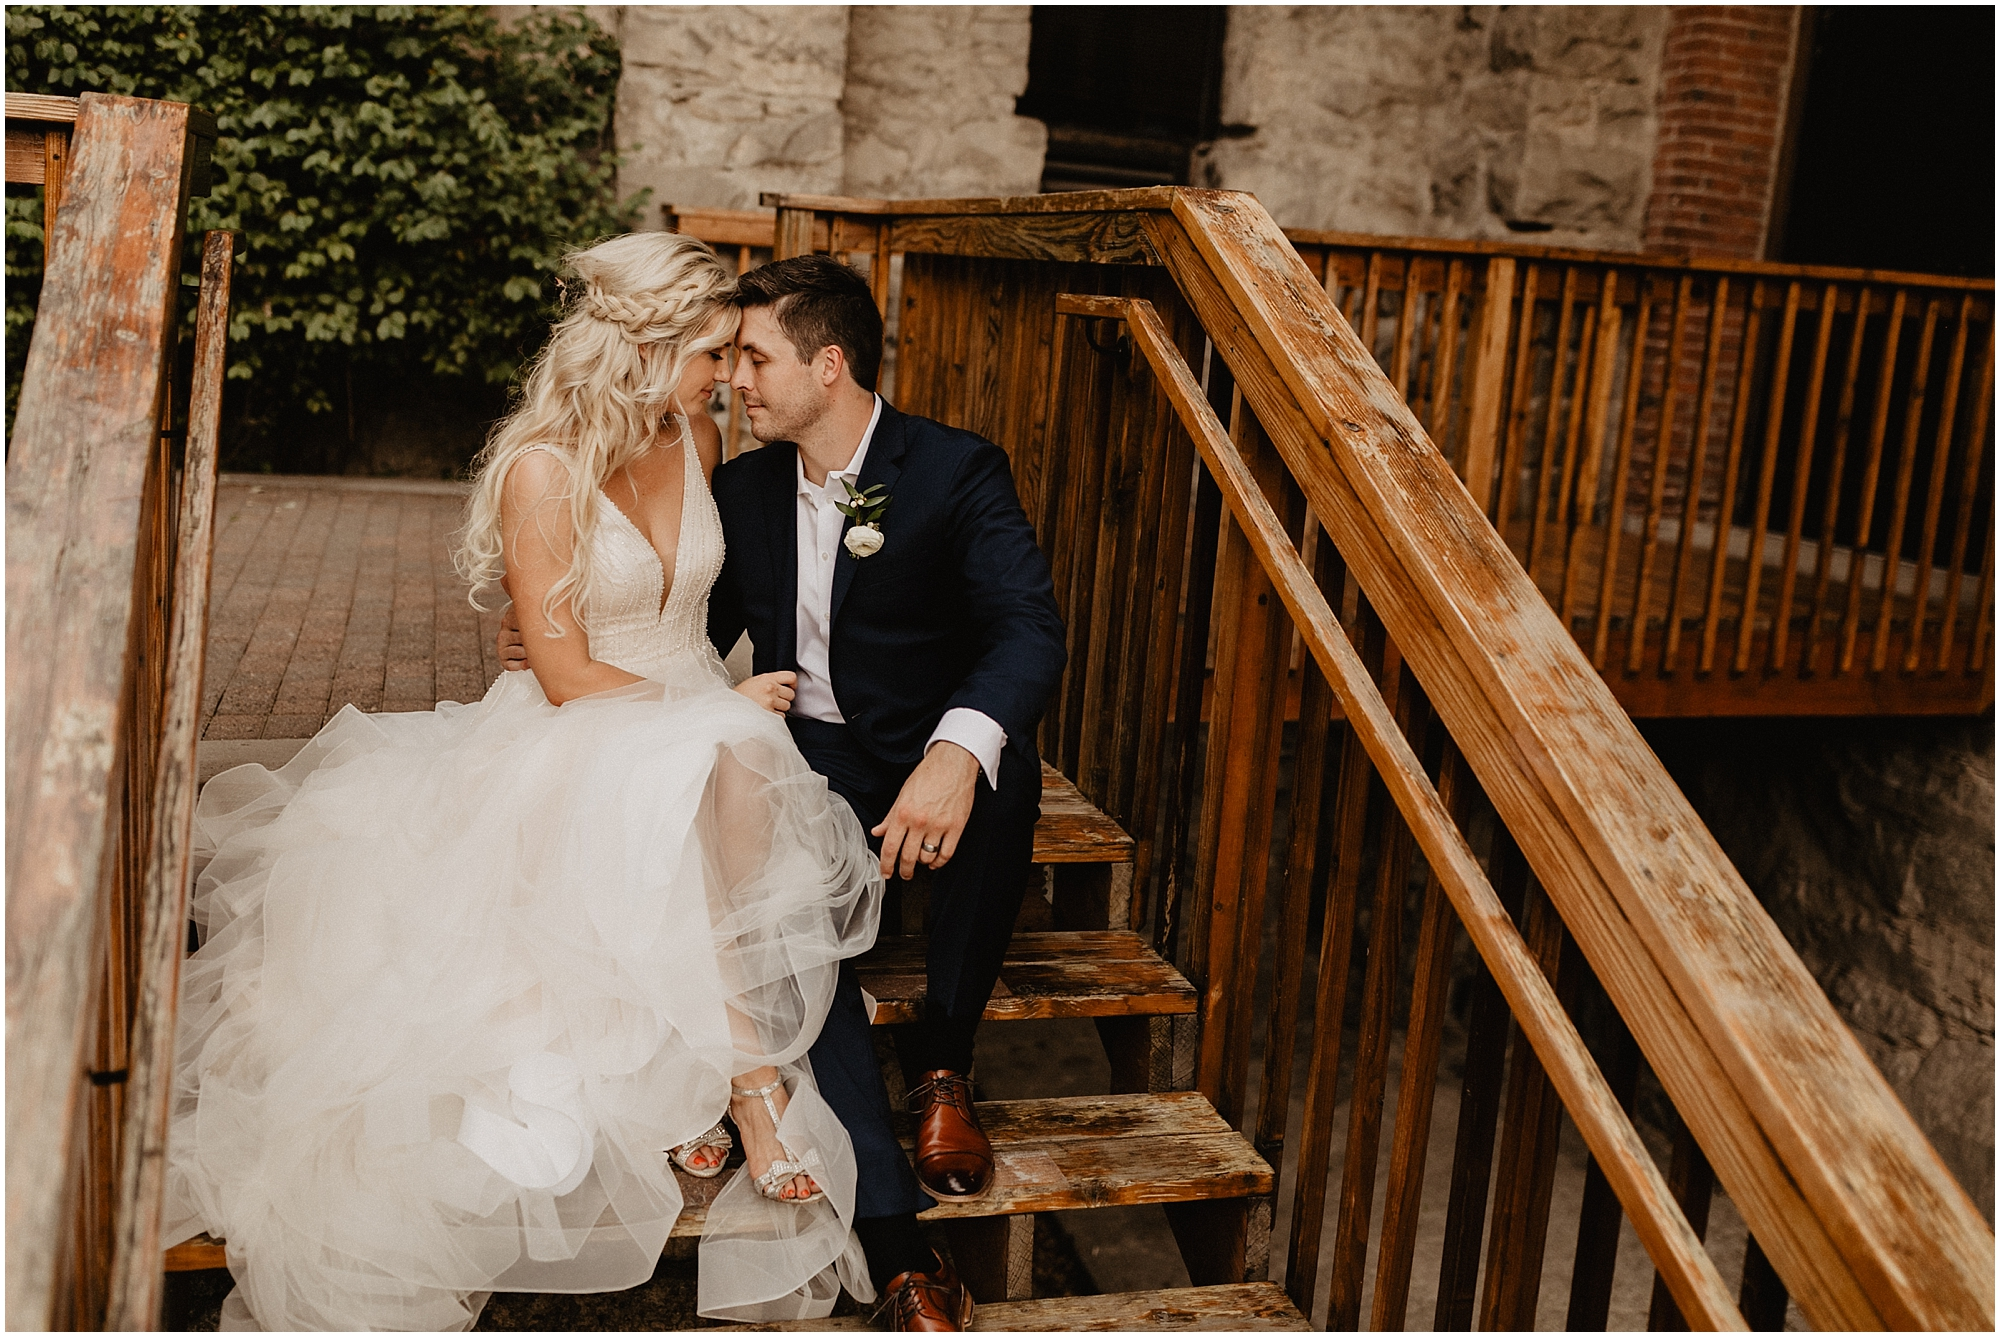 Chateau Rive Spokane Wedding Cassie Trottier Photography1129.jpg